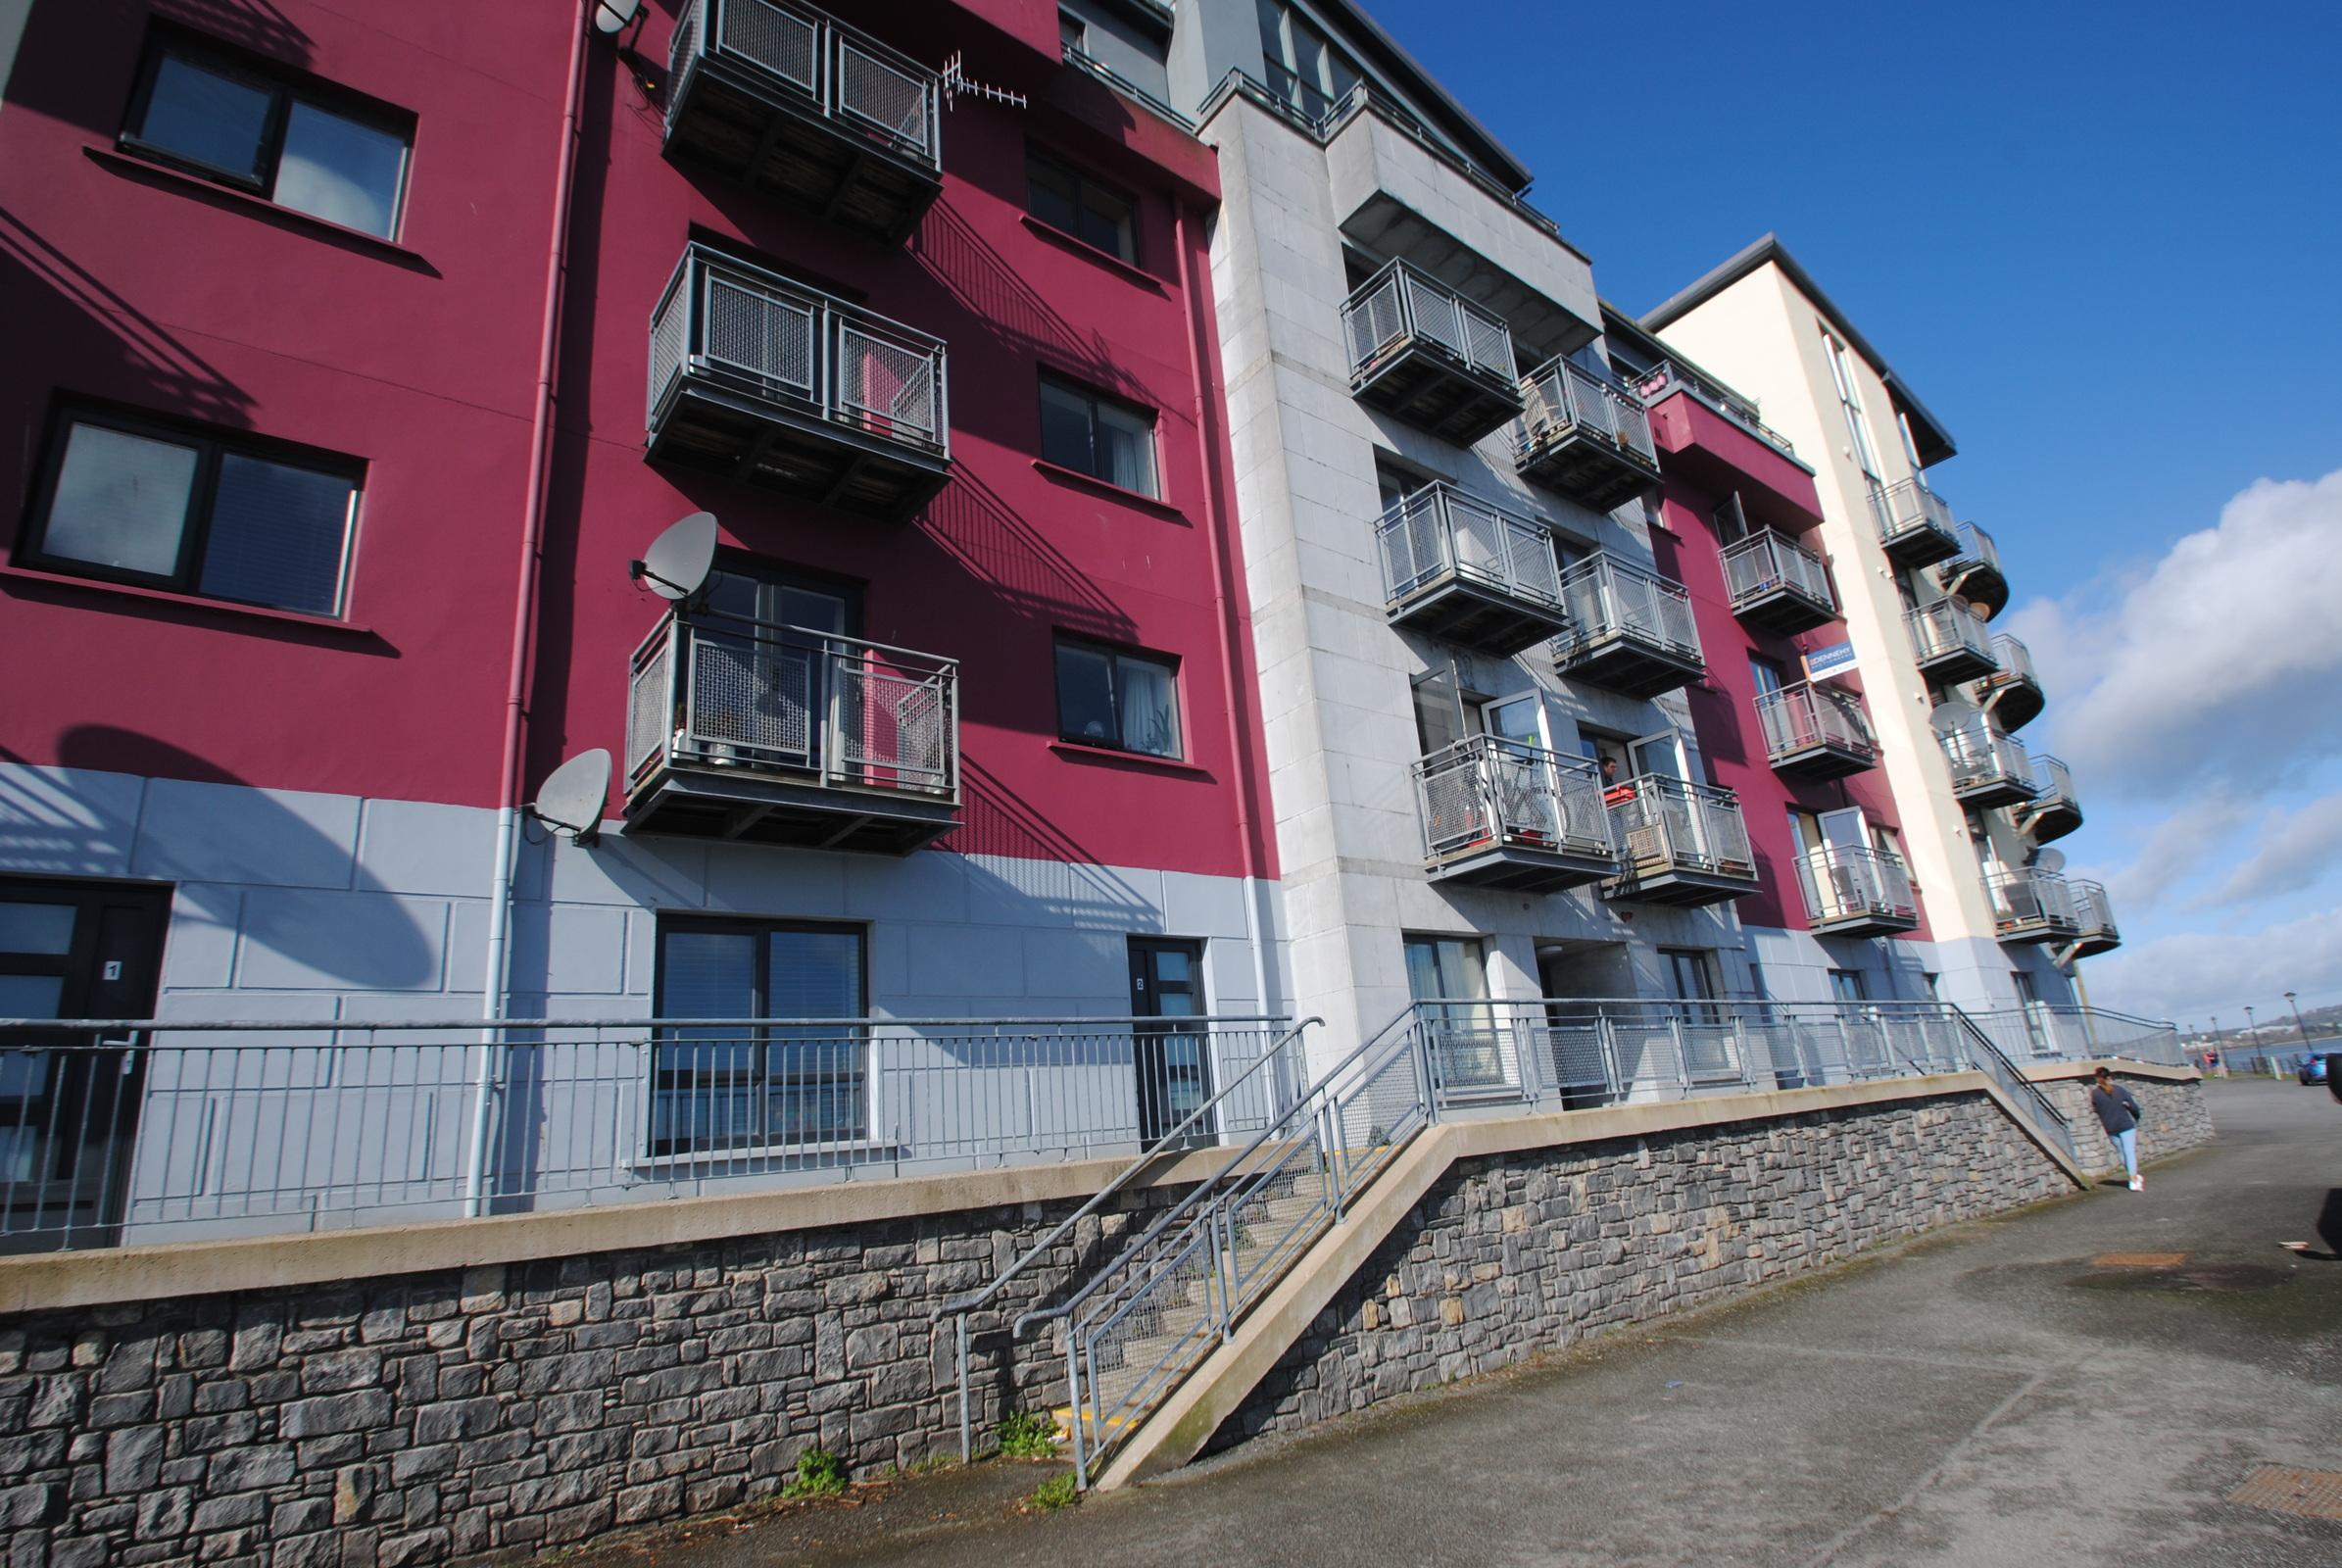 Apartment 7, Mariners Quay, Passage West, Co. Cork